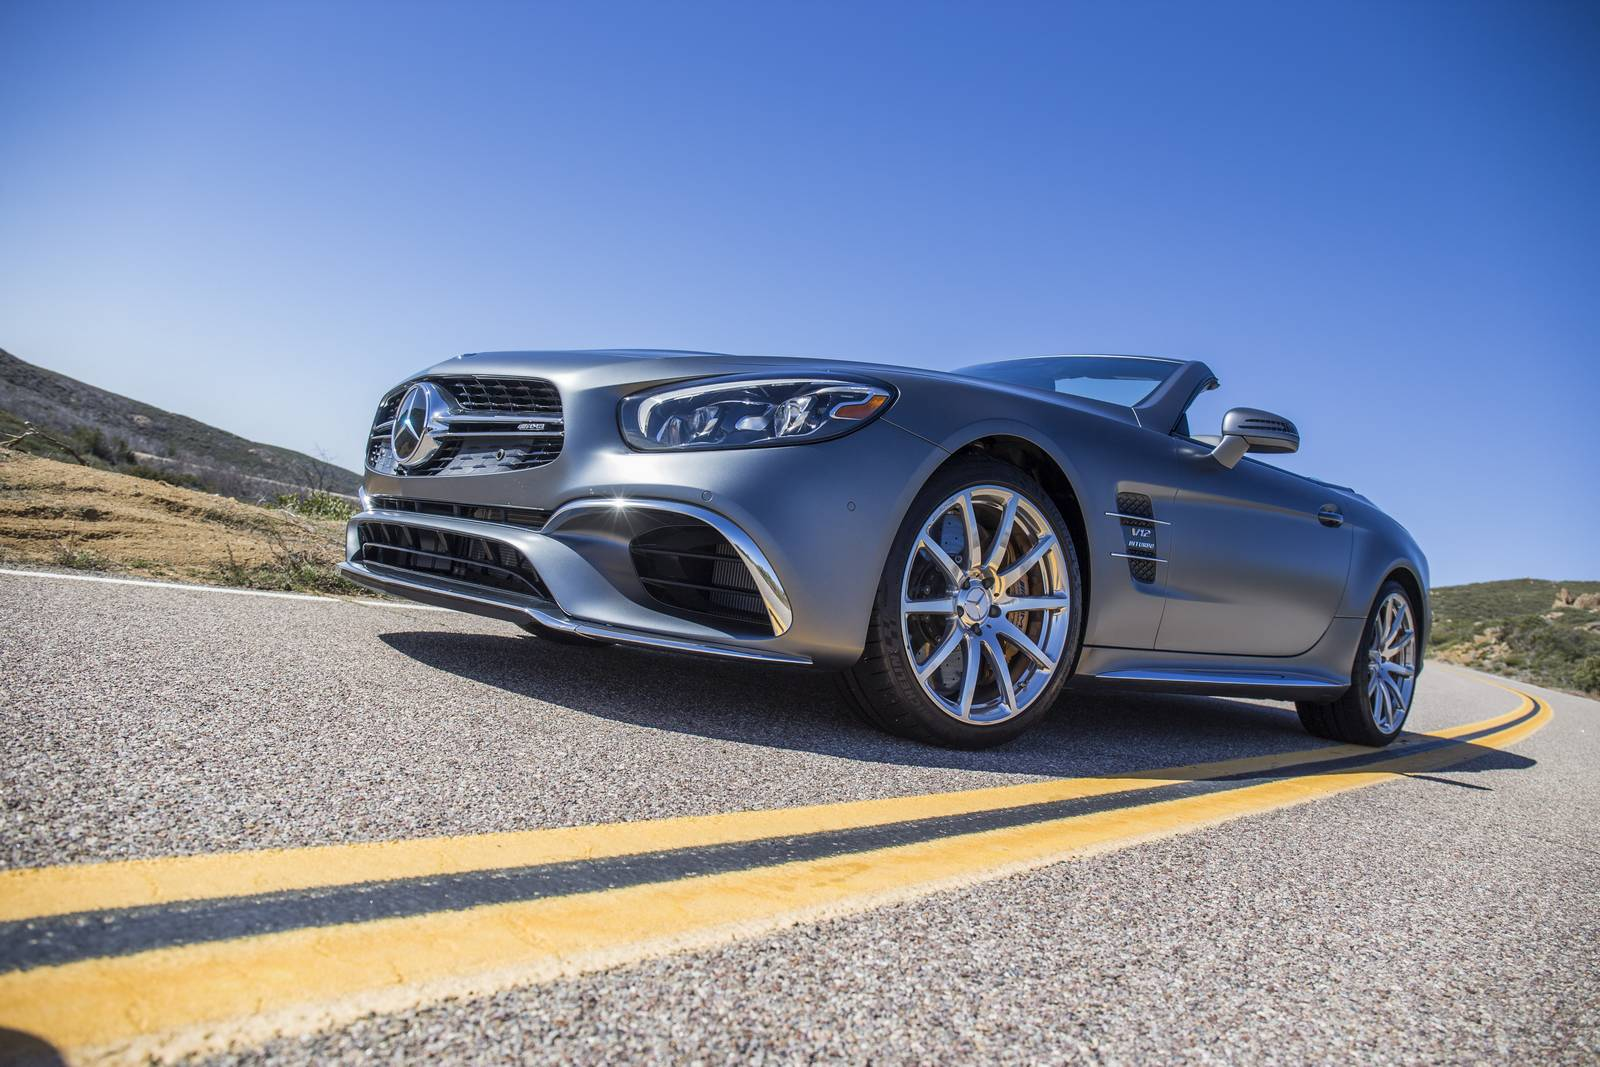 http://gtspirit.com/wp-content/uploads/2016/02/Selenit-Grey-Magno-Mercedes-AMG-SL-65-1.jpg